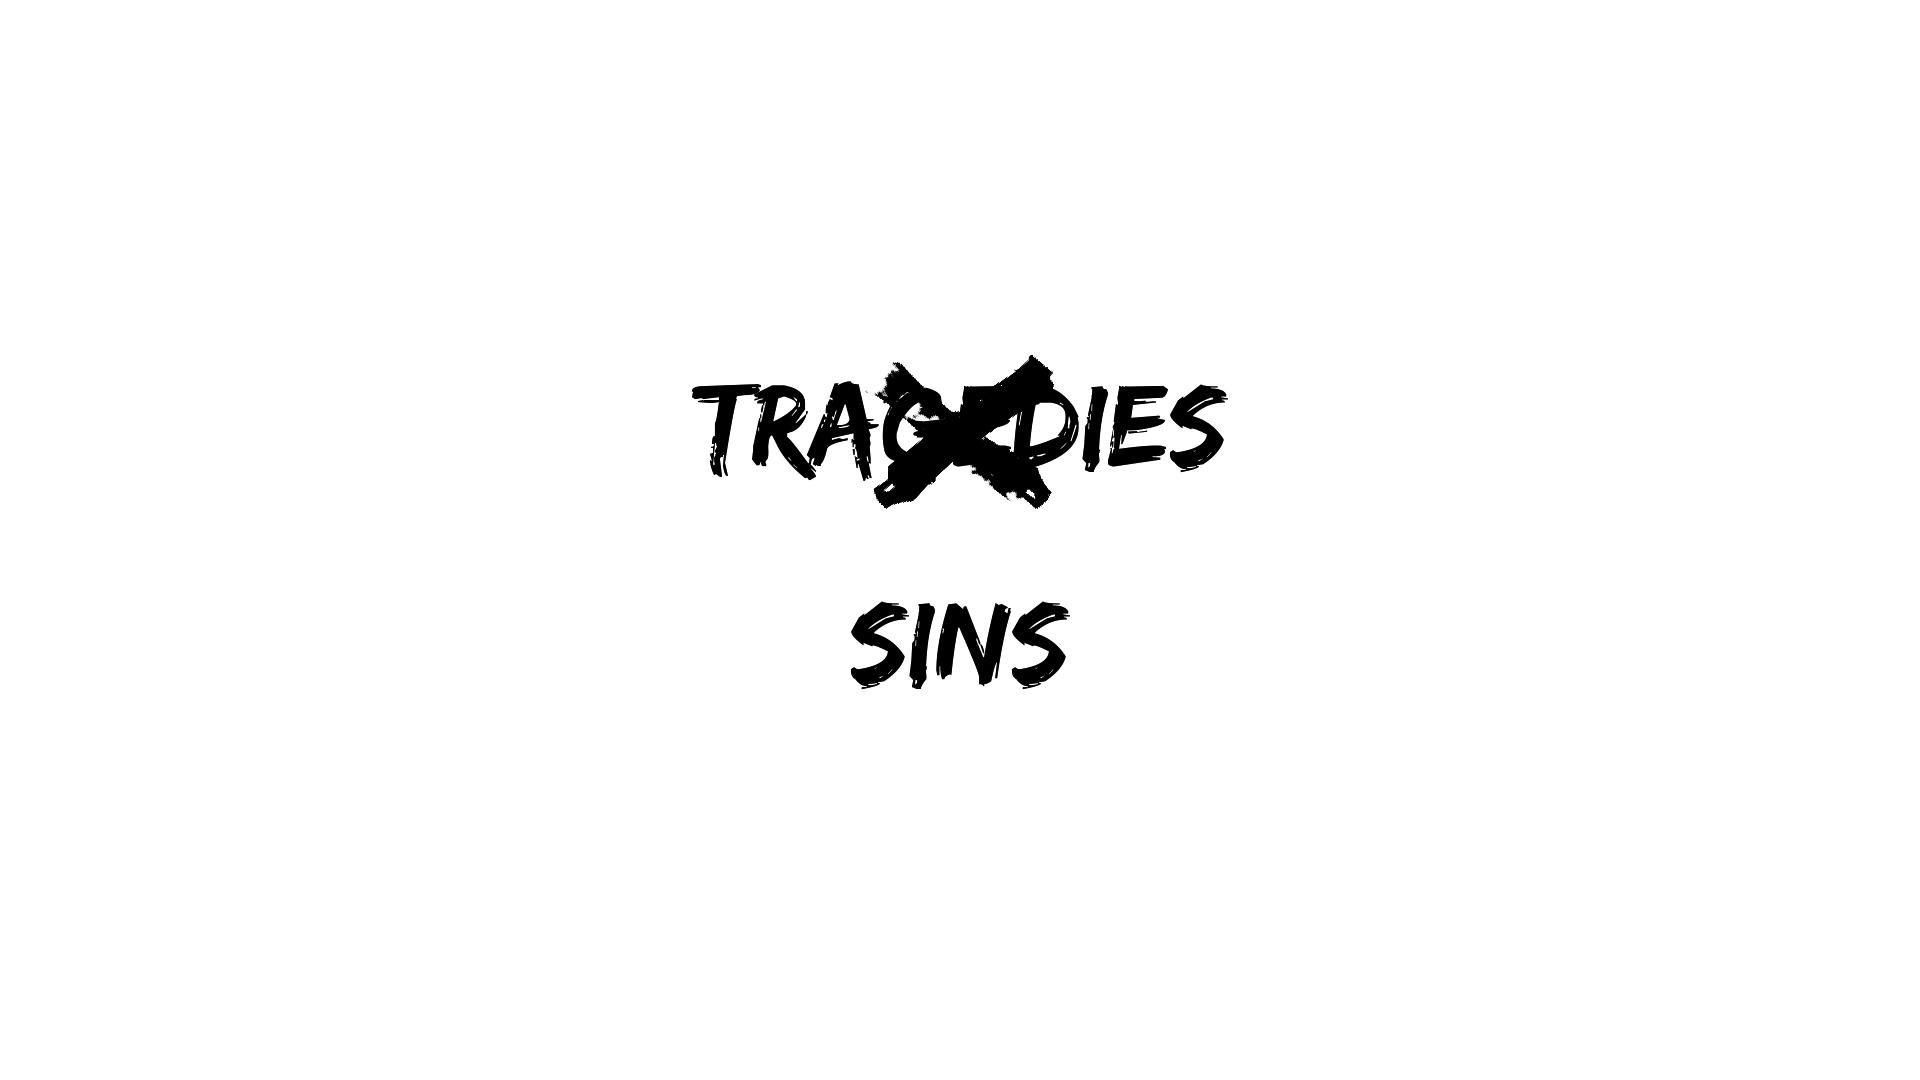 Fall Out Boy Logo Iphone Wallpaper I Write Sins Not Tragedies Hd Wallpaper Background Image